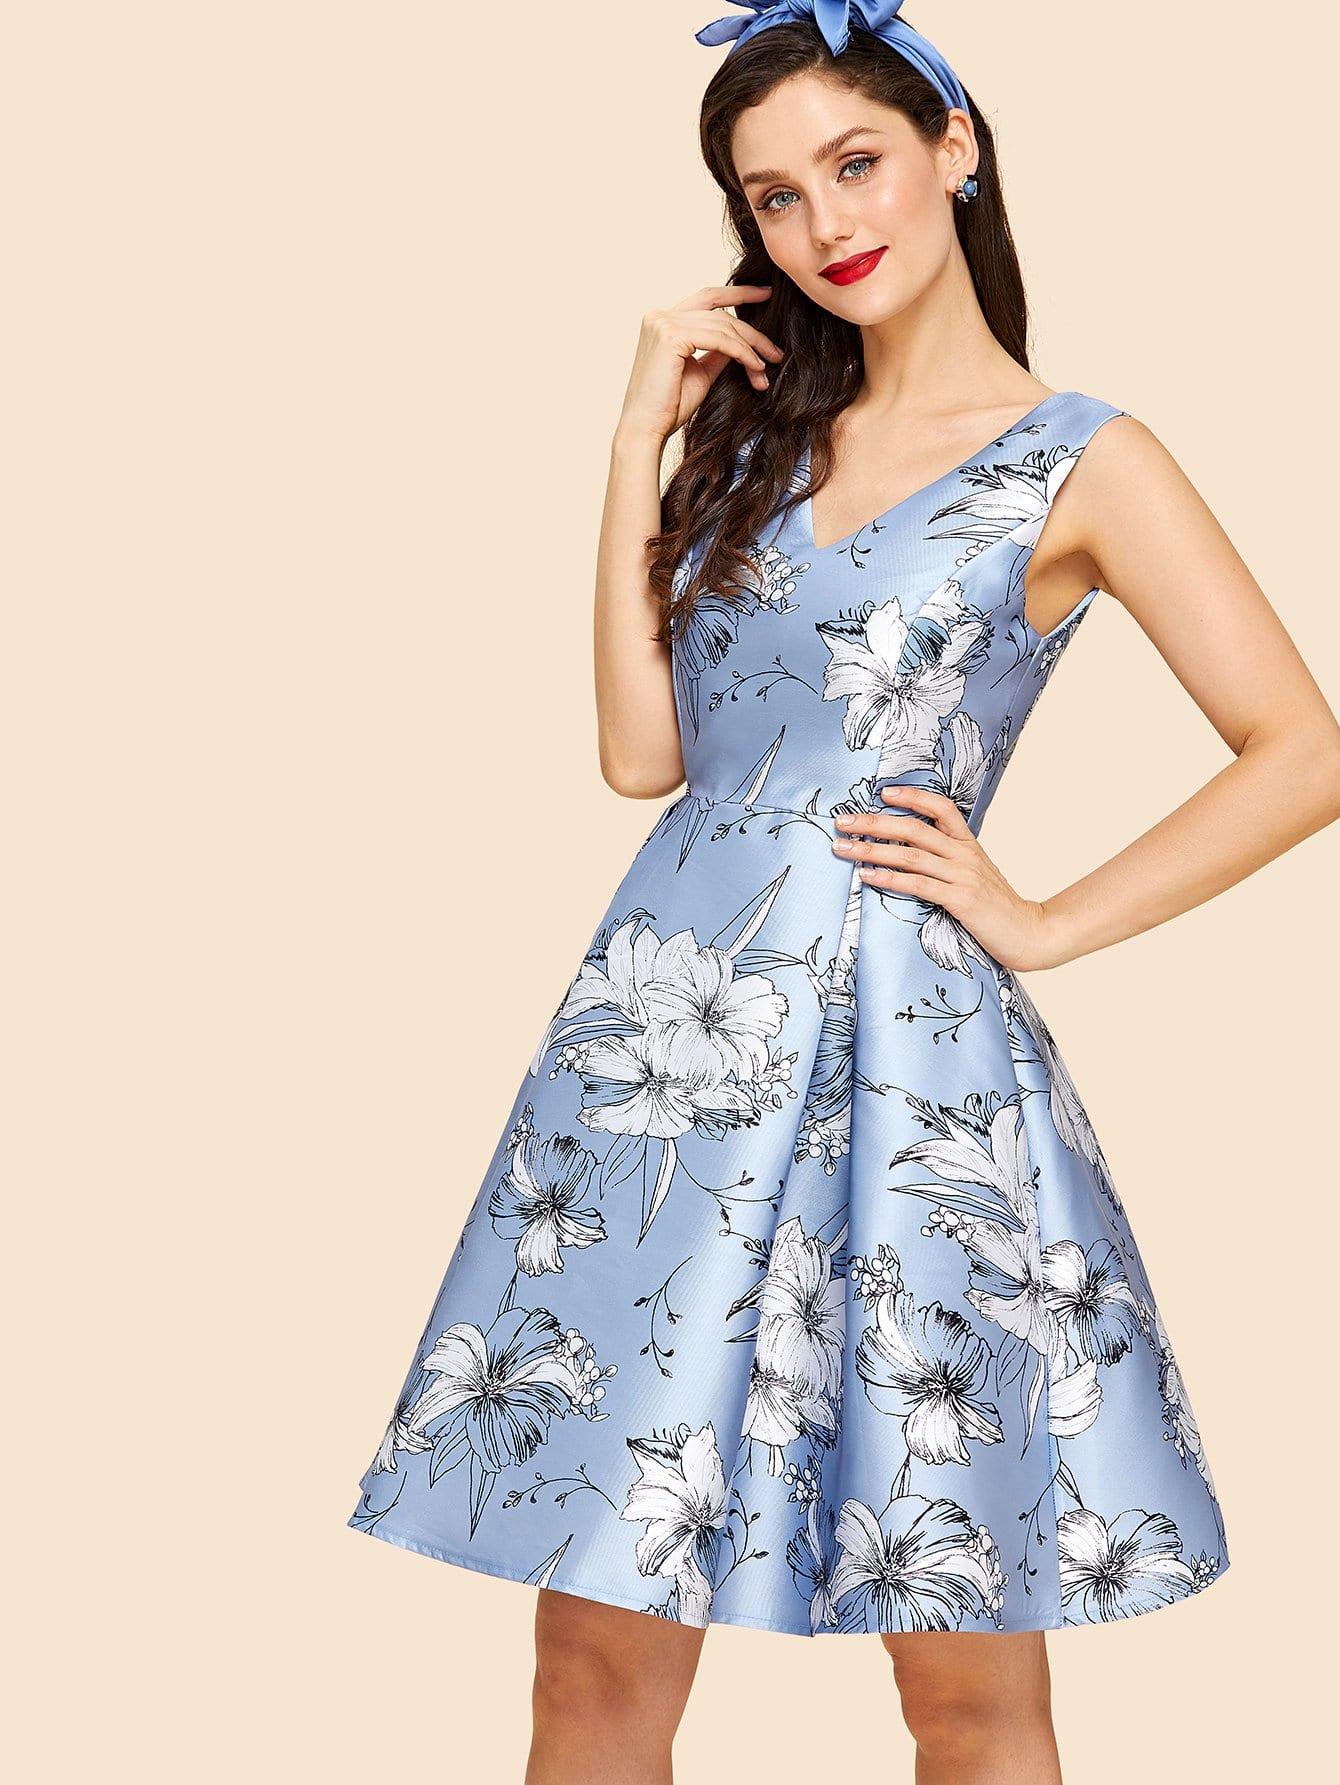 Flower Print Box Pleated Fit & Flare Dress flower print box pleated skirt